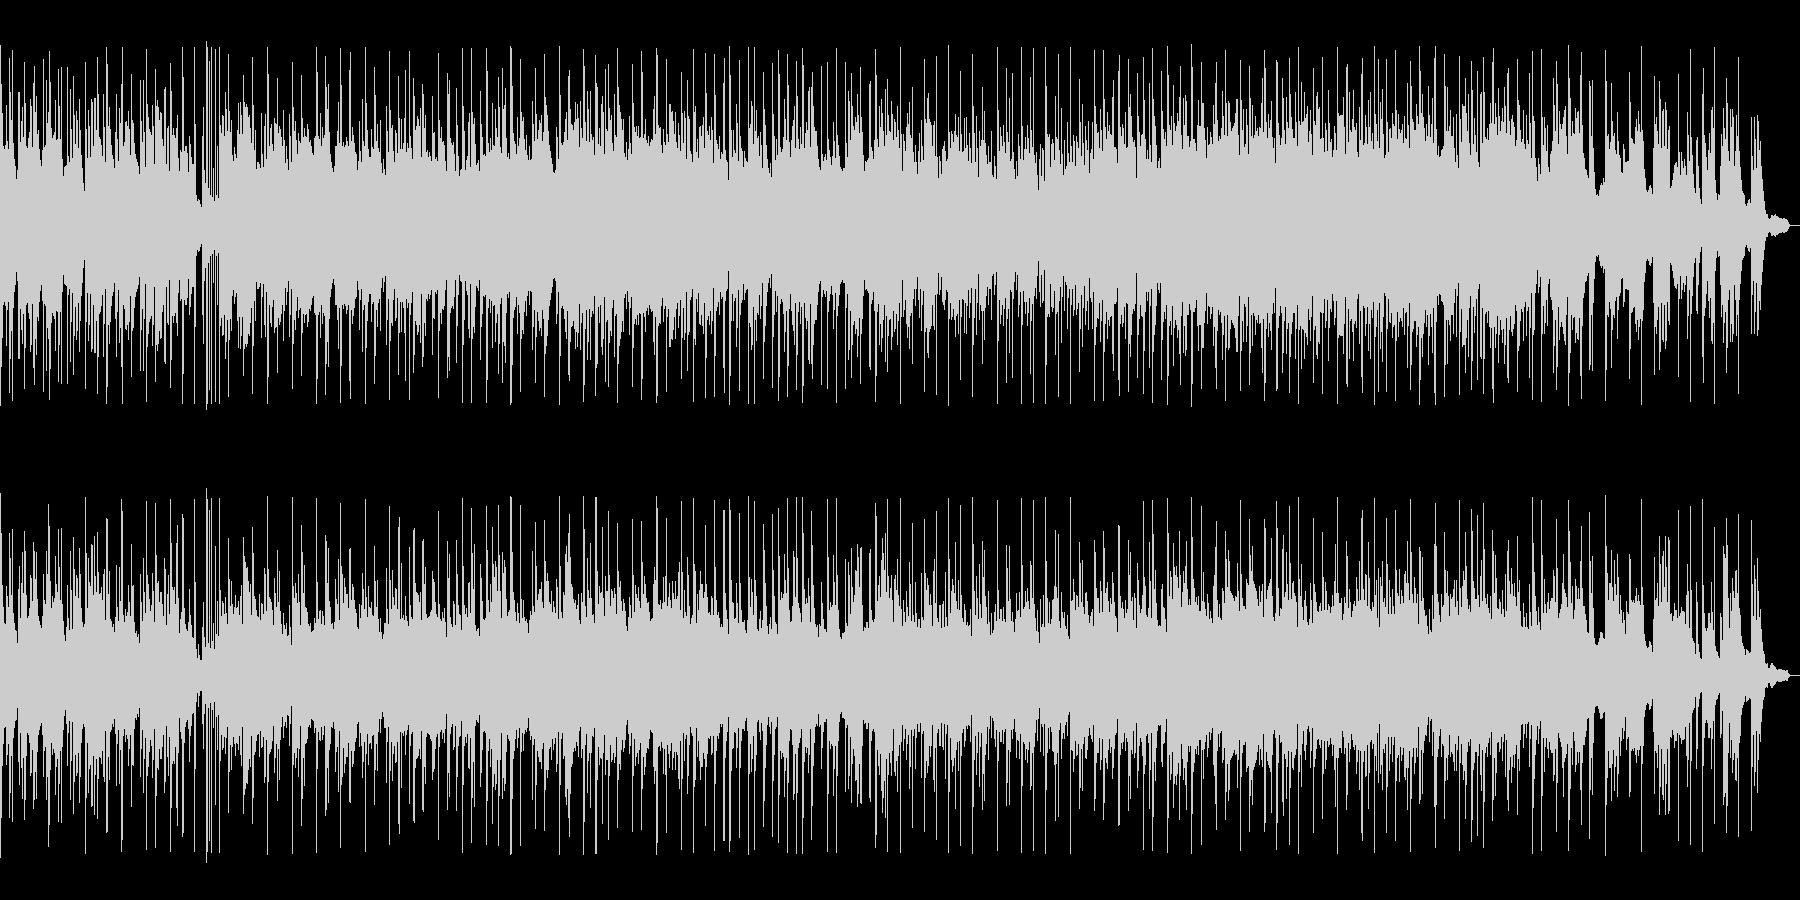 BGM016-01 ピアノとギターの落…の未再生の波形